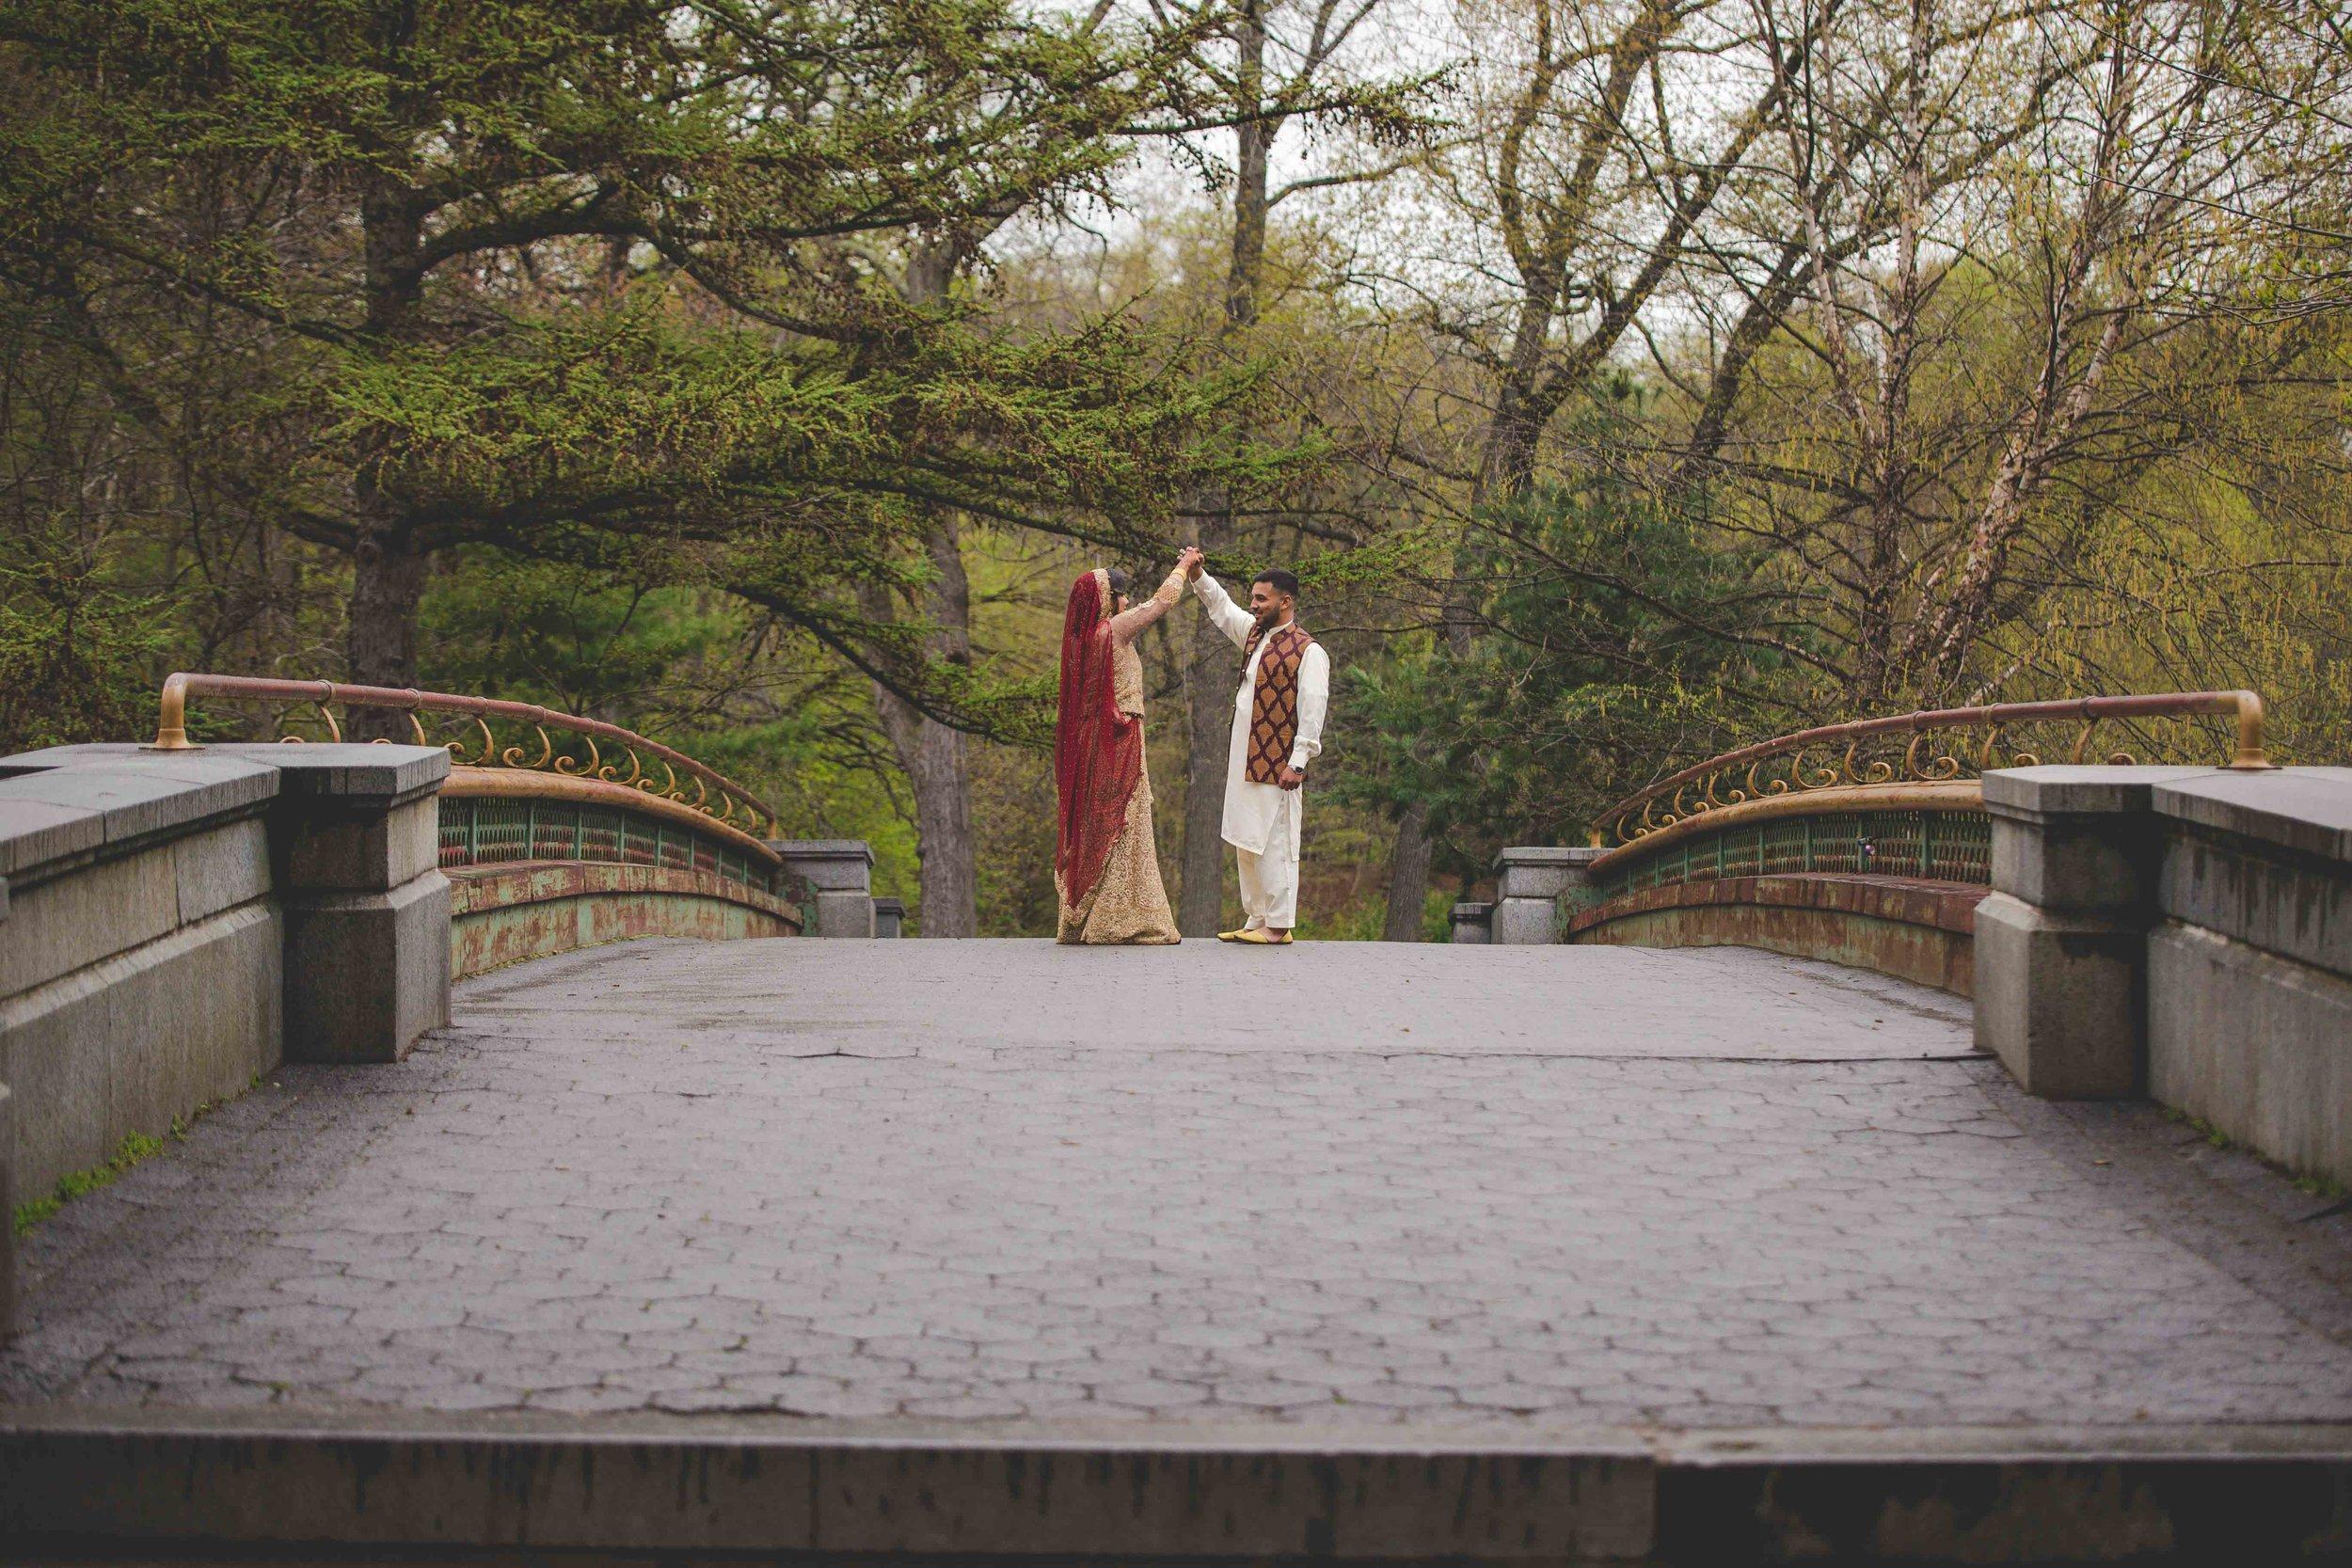 pakistani-wedding-photographer-brooklyn-new-york-47.jpg